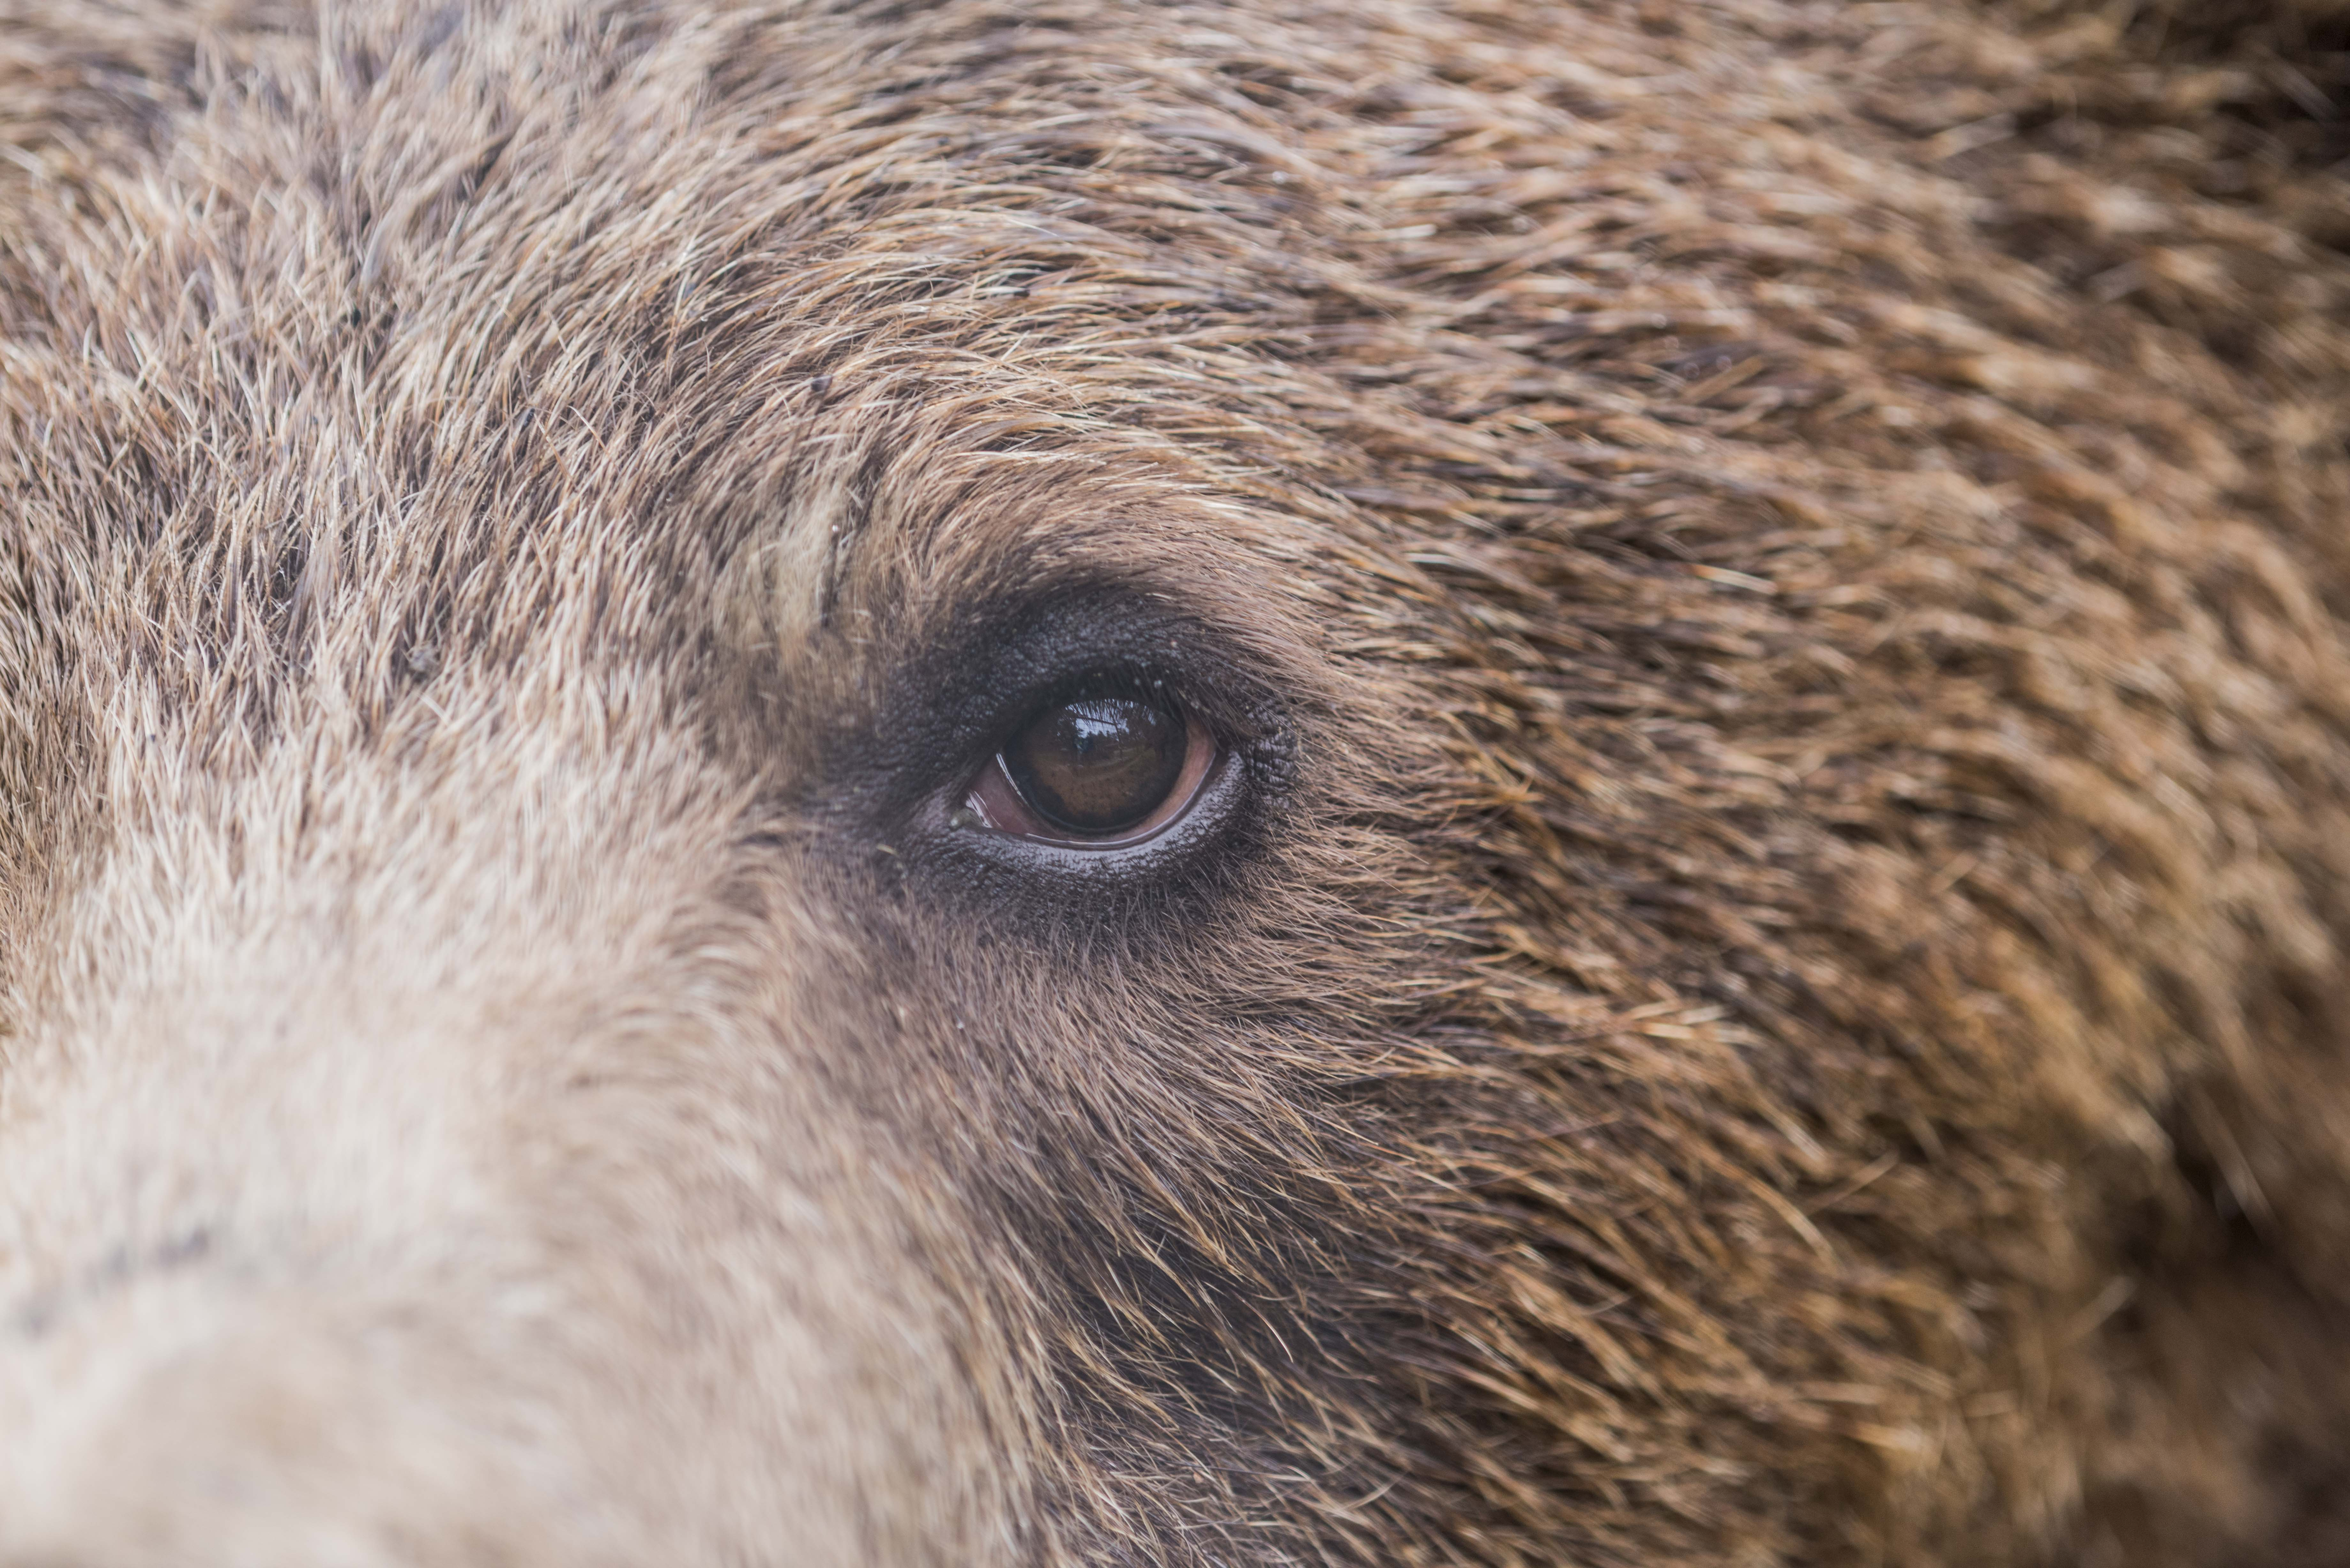 Oyster Worldwide – Volunteer with Bears in Romania